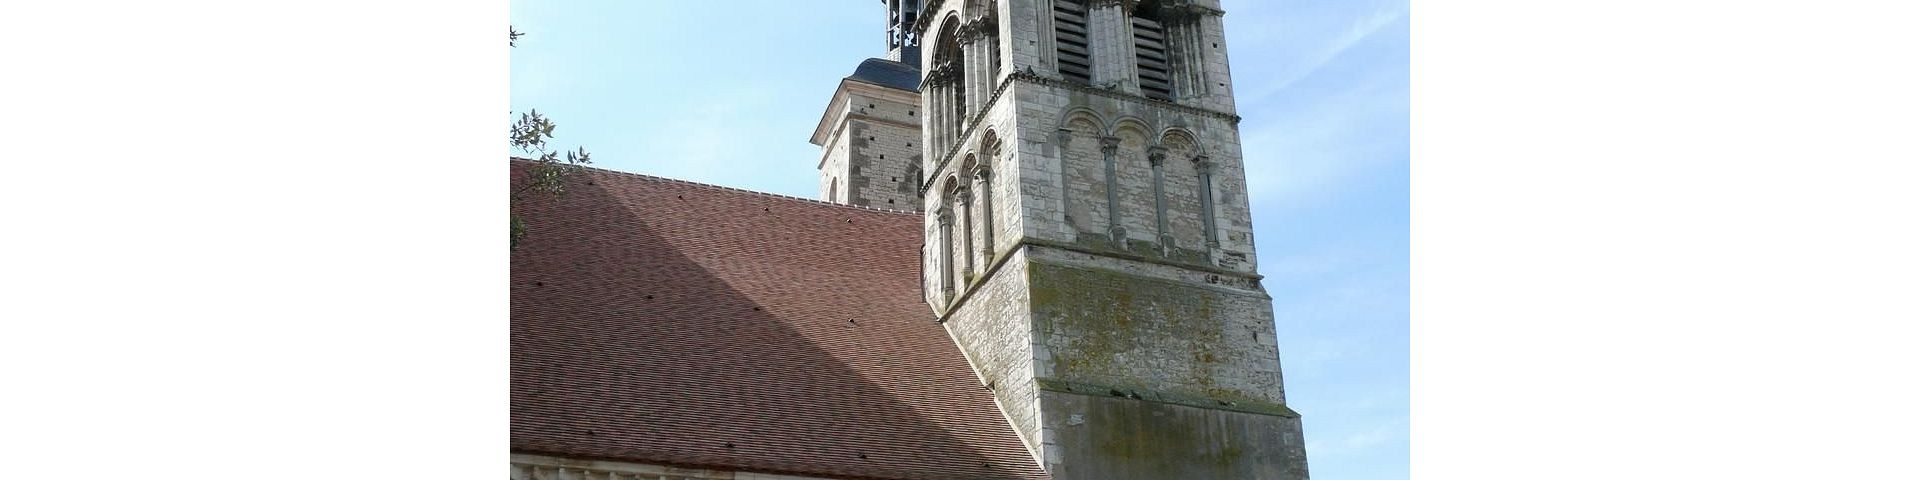 Vermenton - Eglise (89)